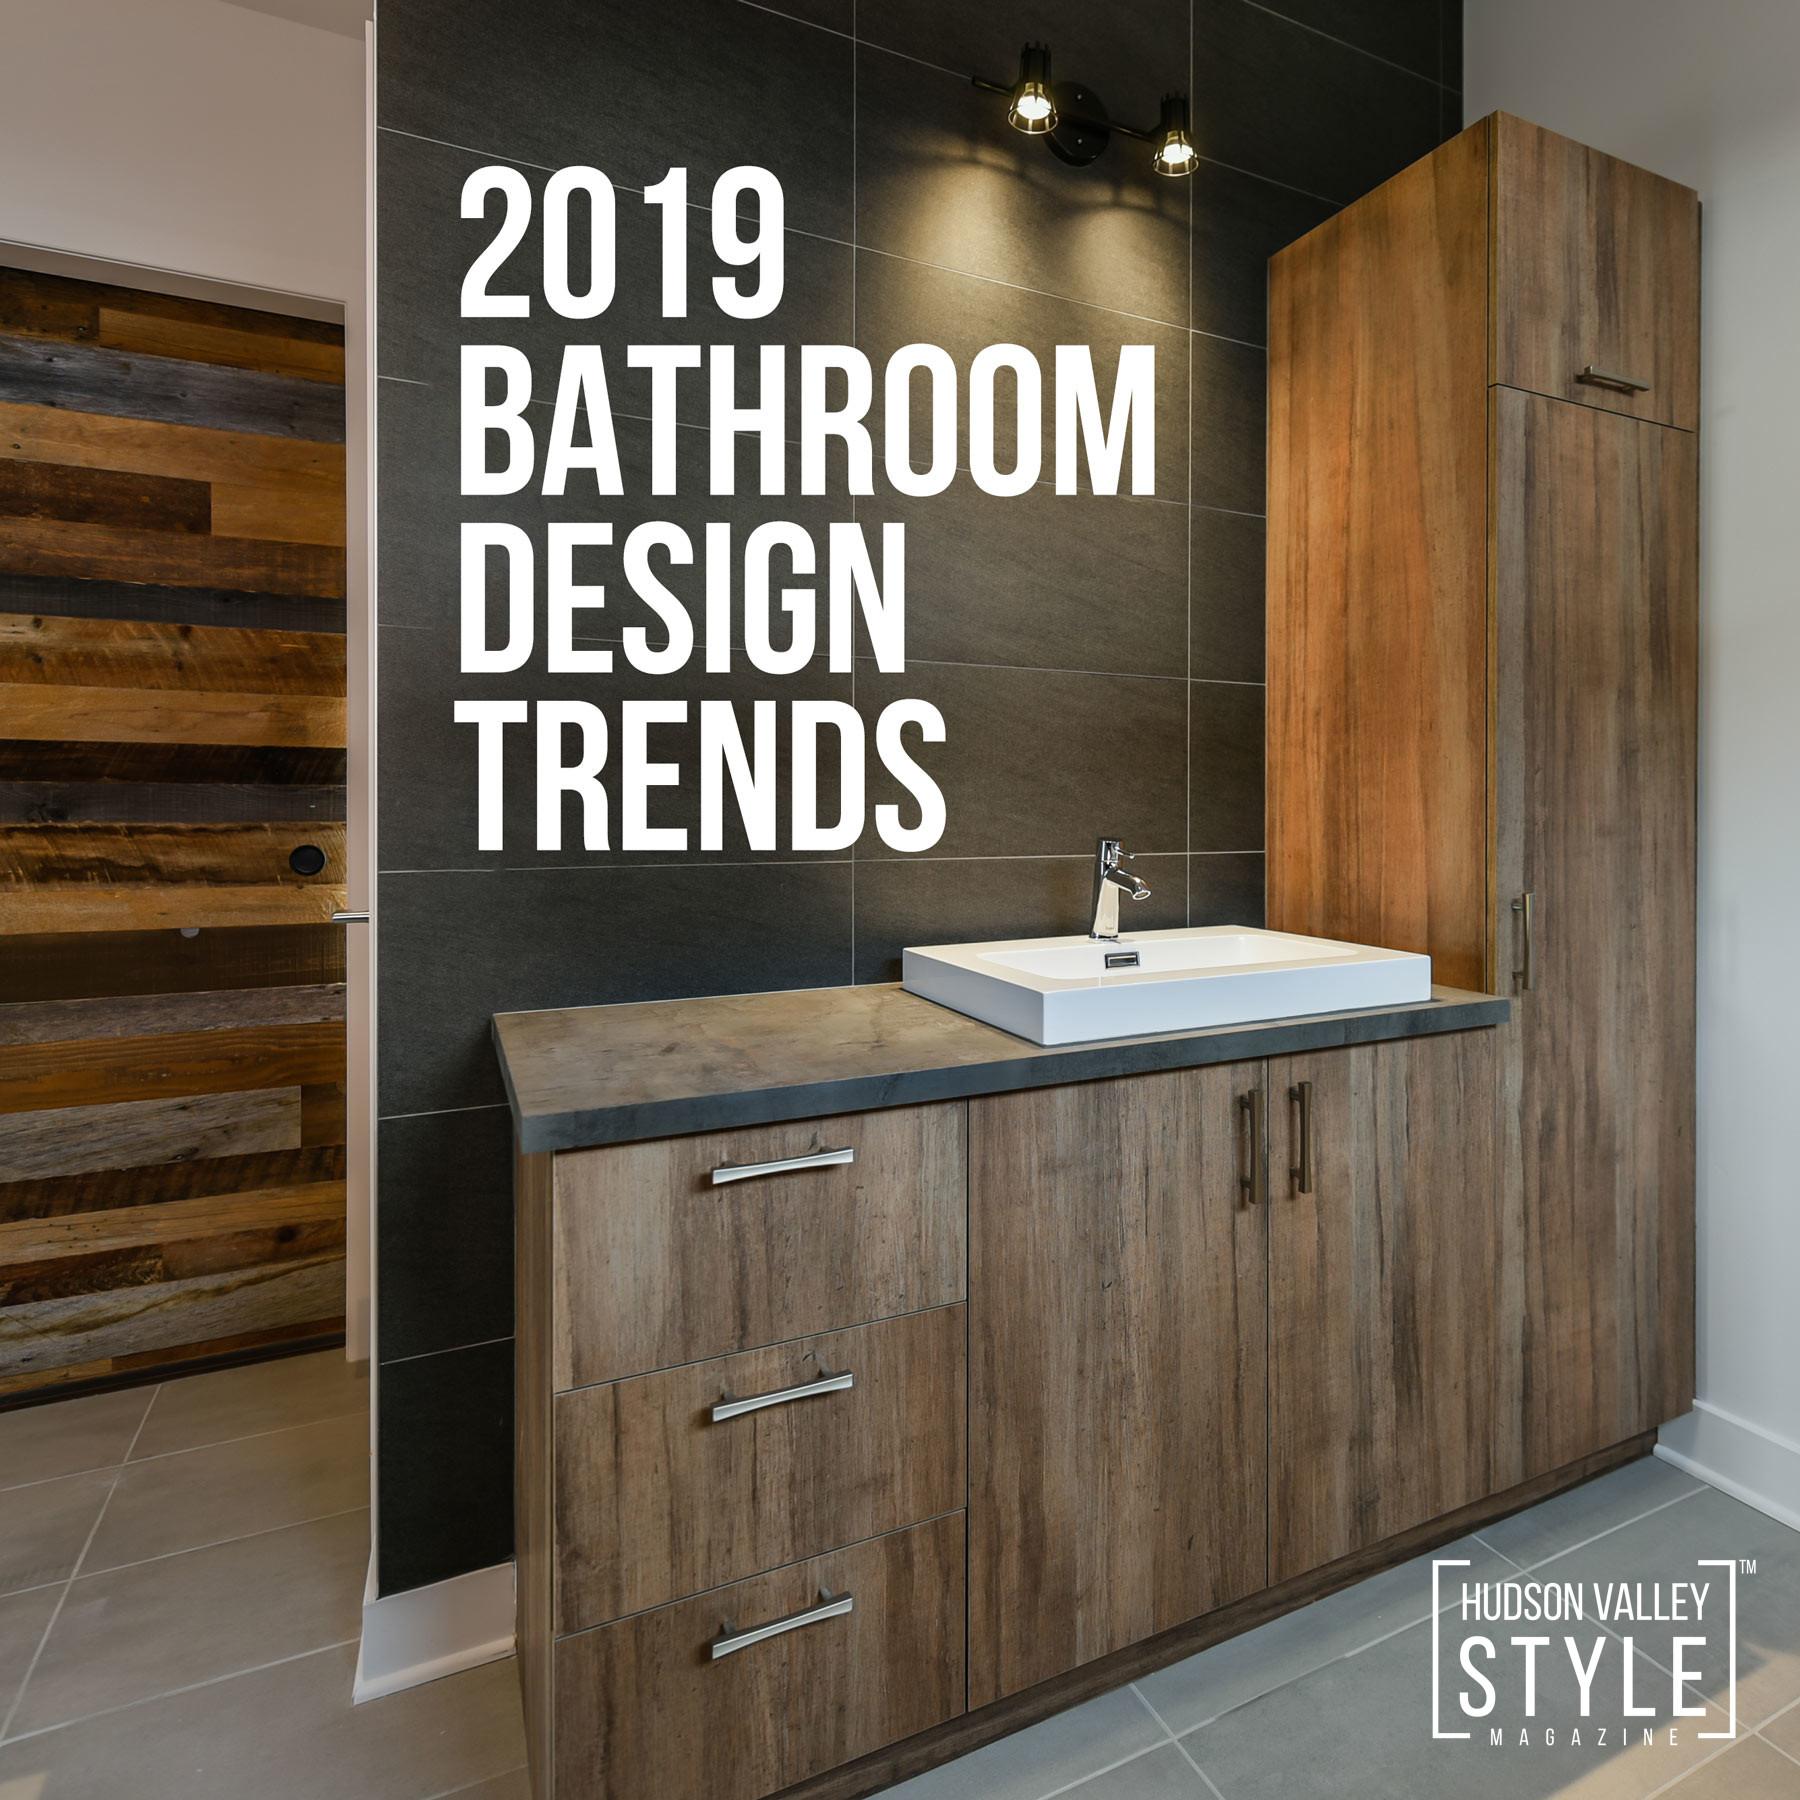 2019 Bathroom Design Trends - Bathroom Design Ideas ... on Small Bathroom Remodel Ideas 2019  id=87880